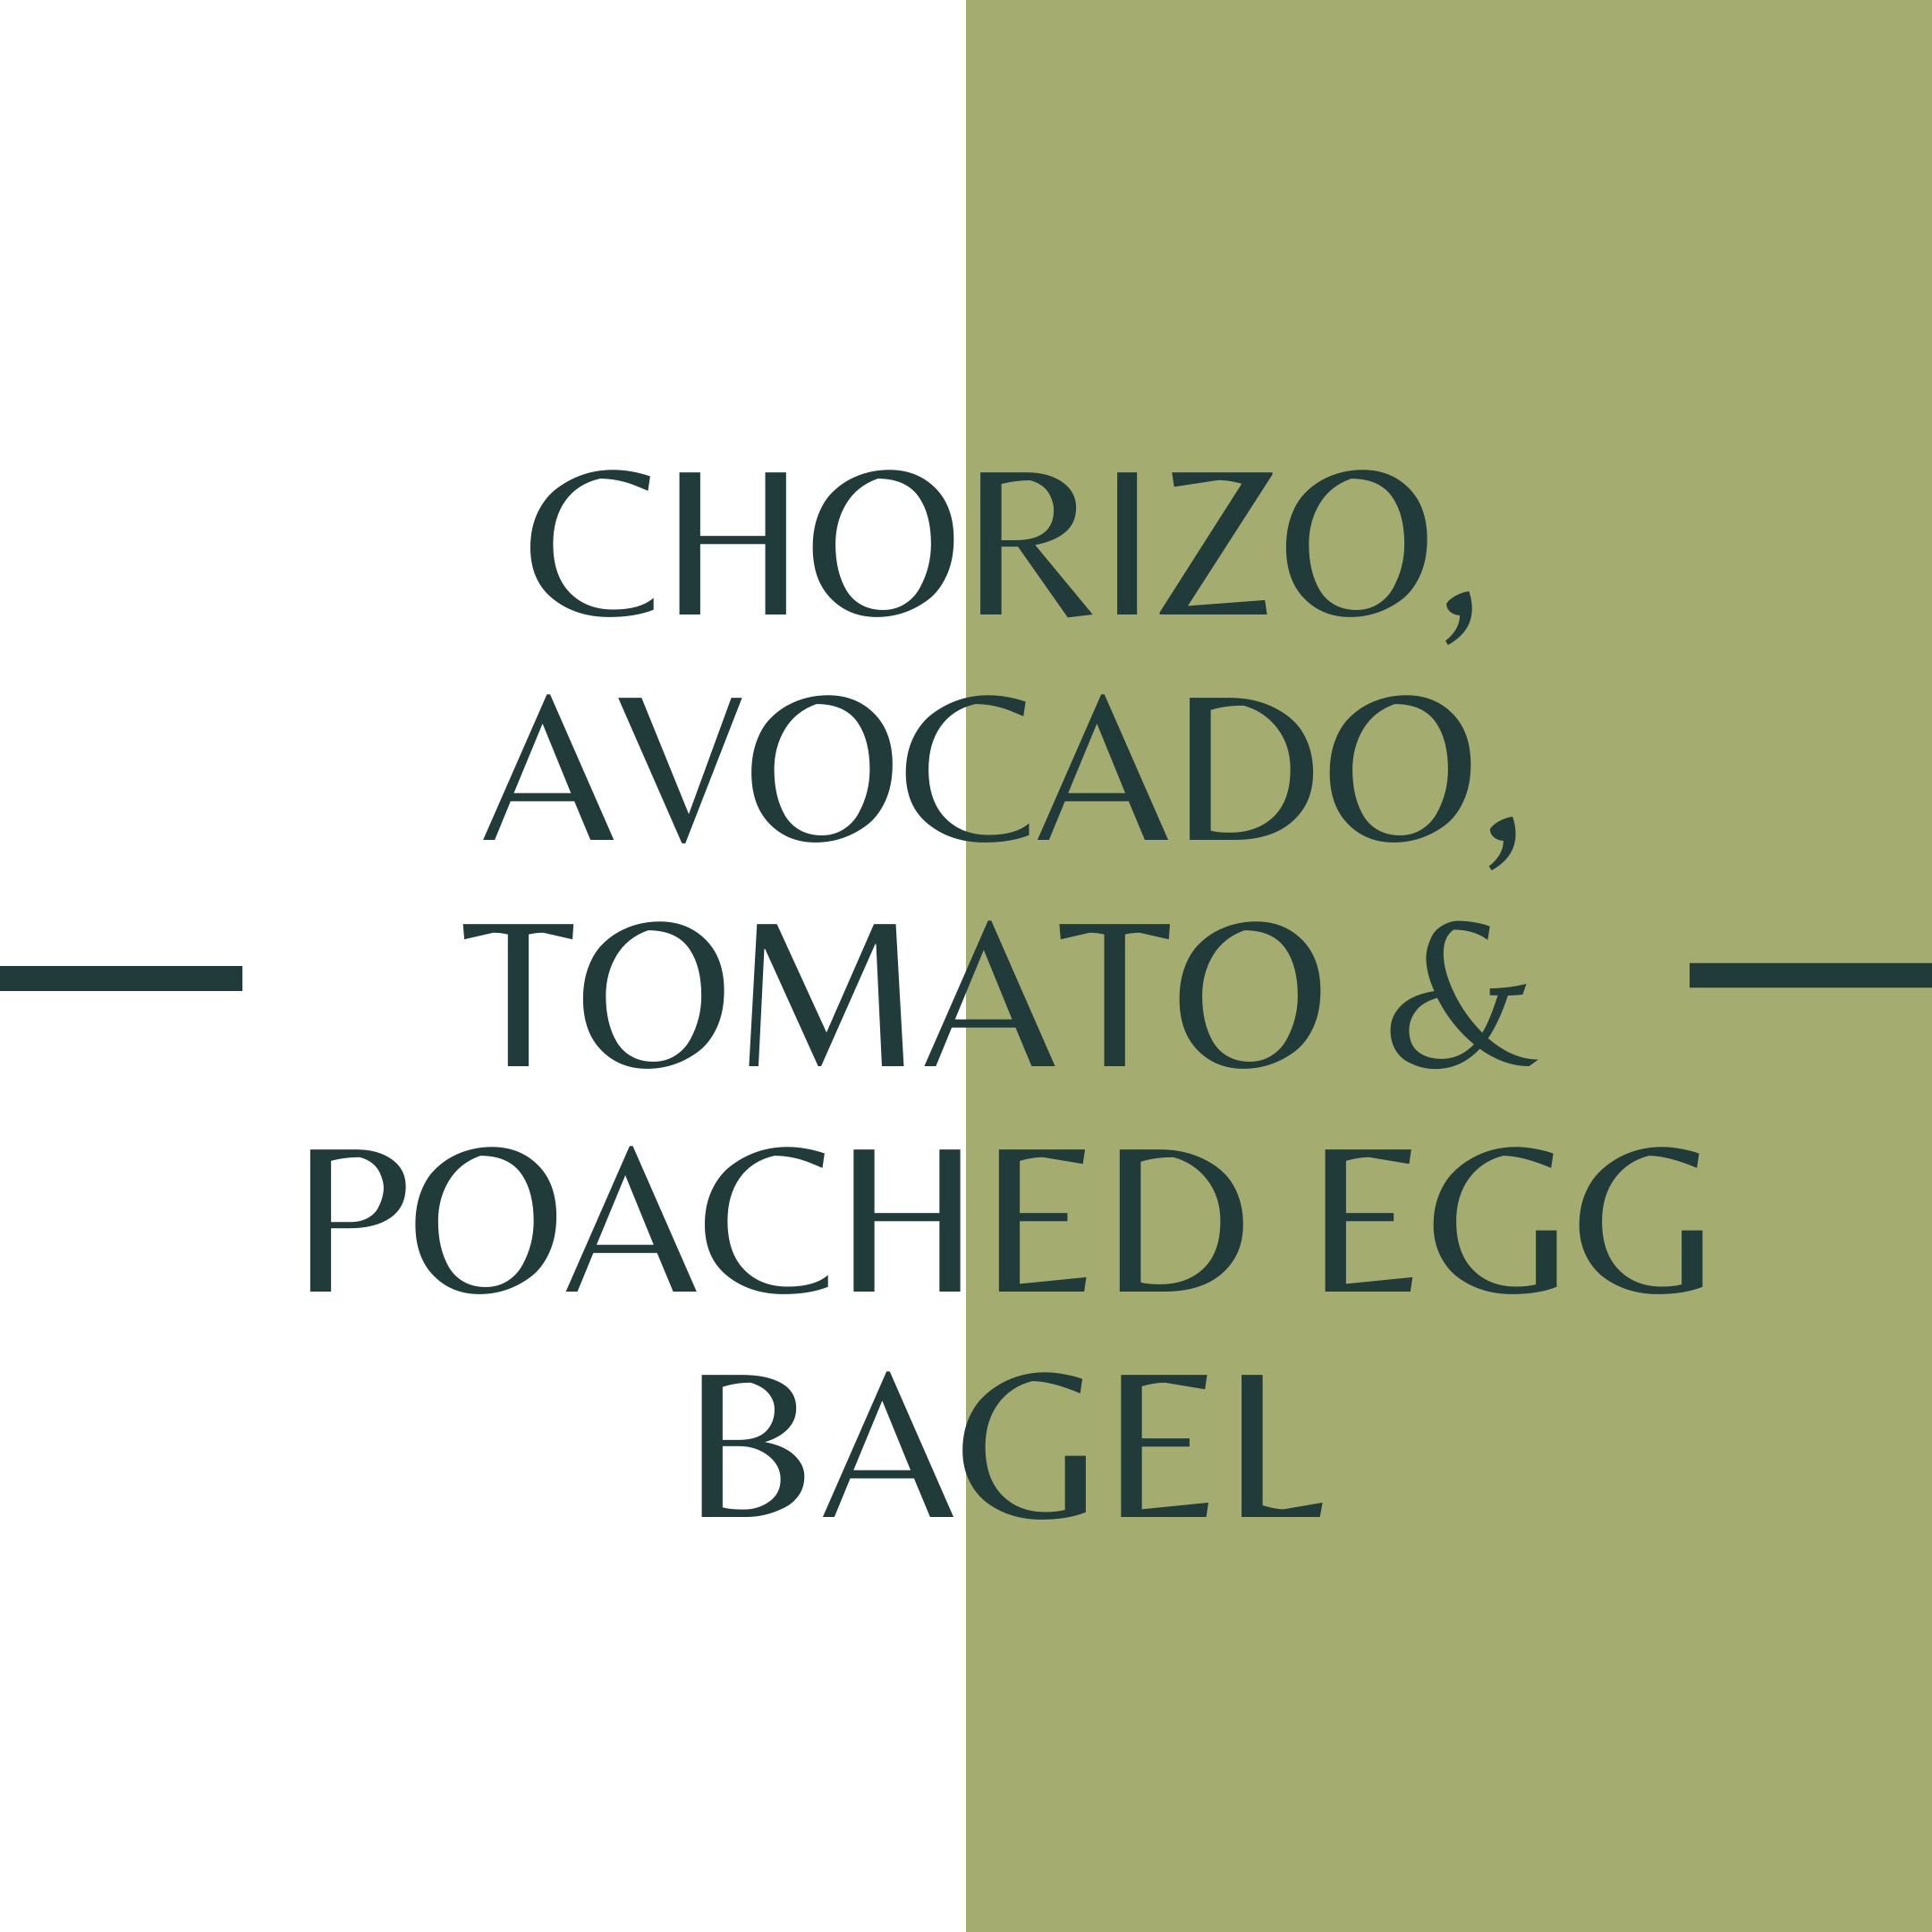 Chorizo, Avocado, Tomato & Poached egg Bagel